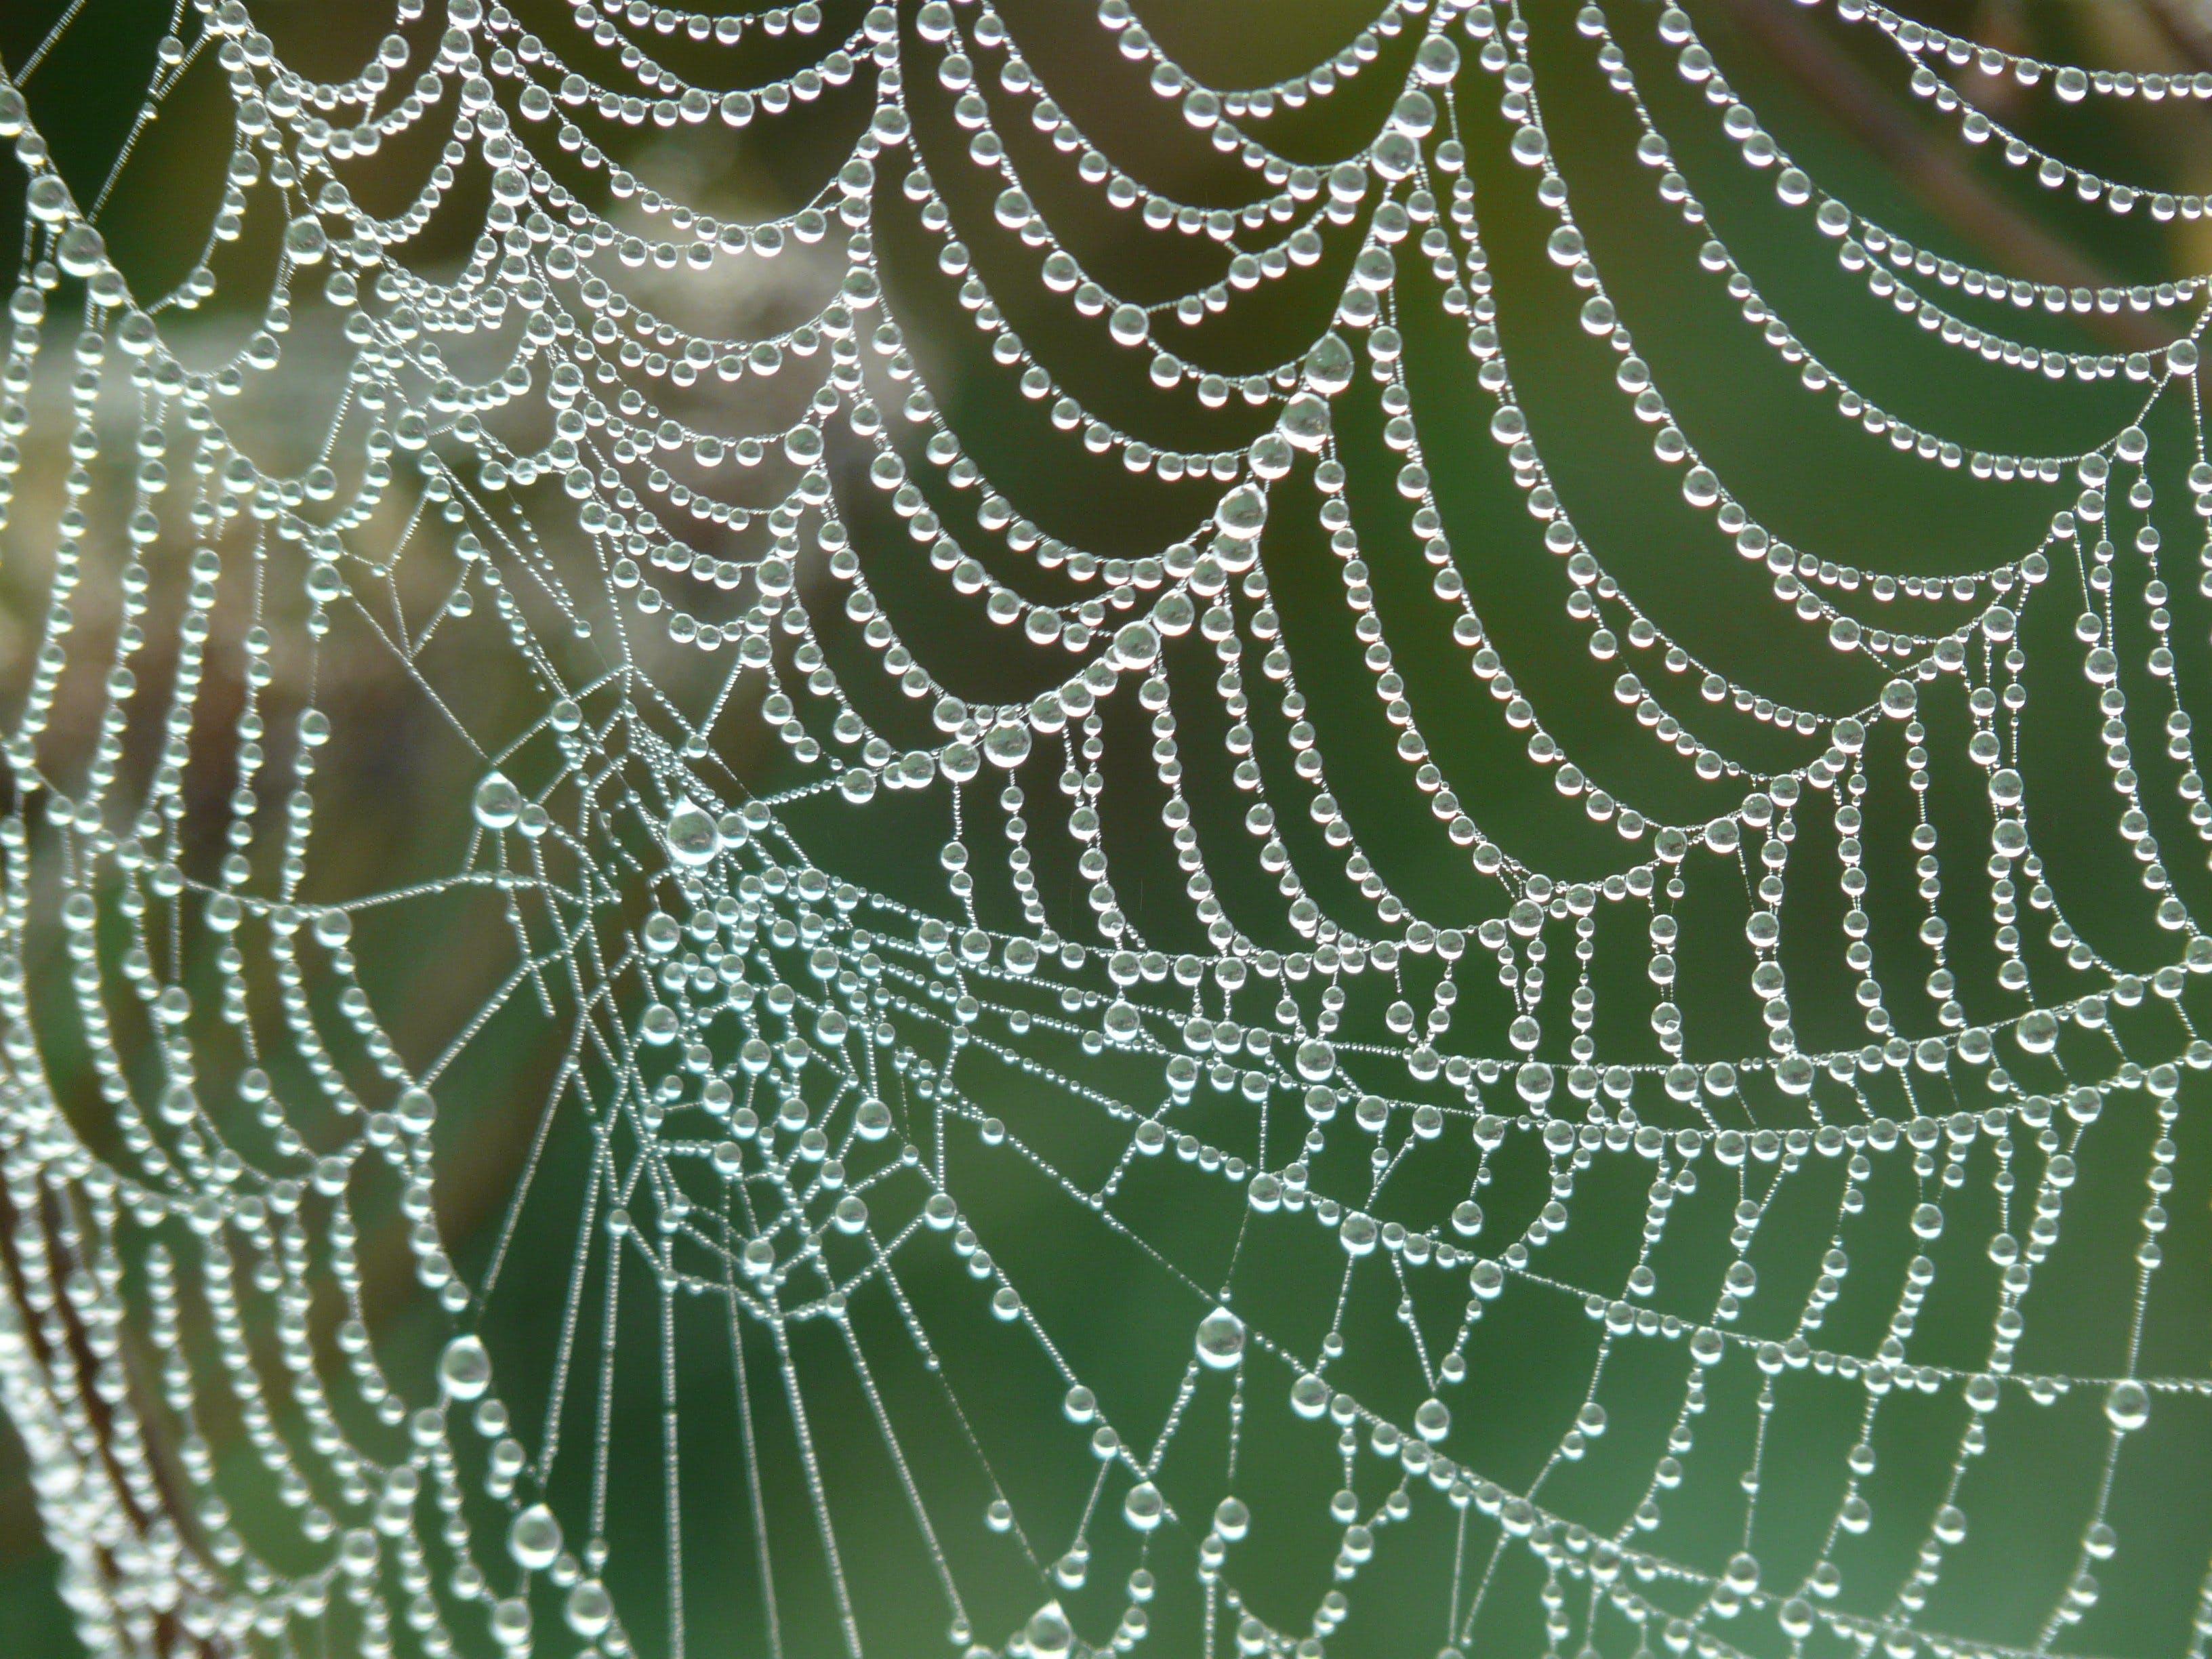 nahansicht, netz, spinnennetz